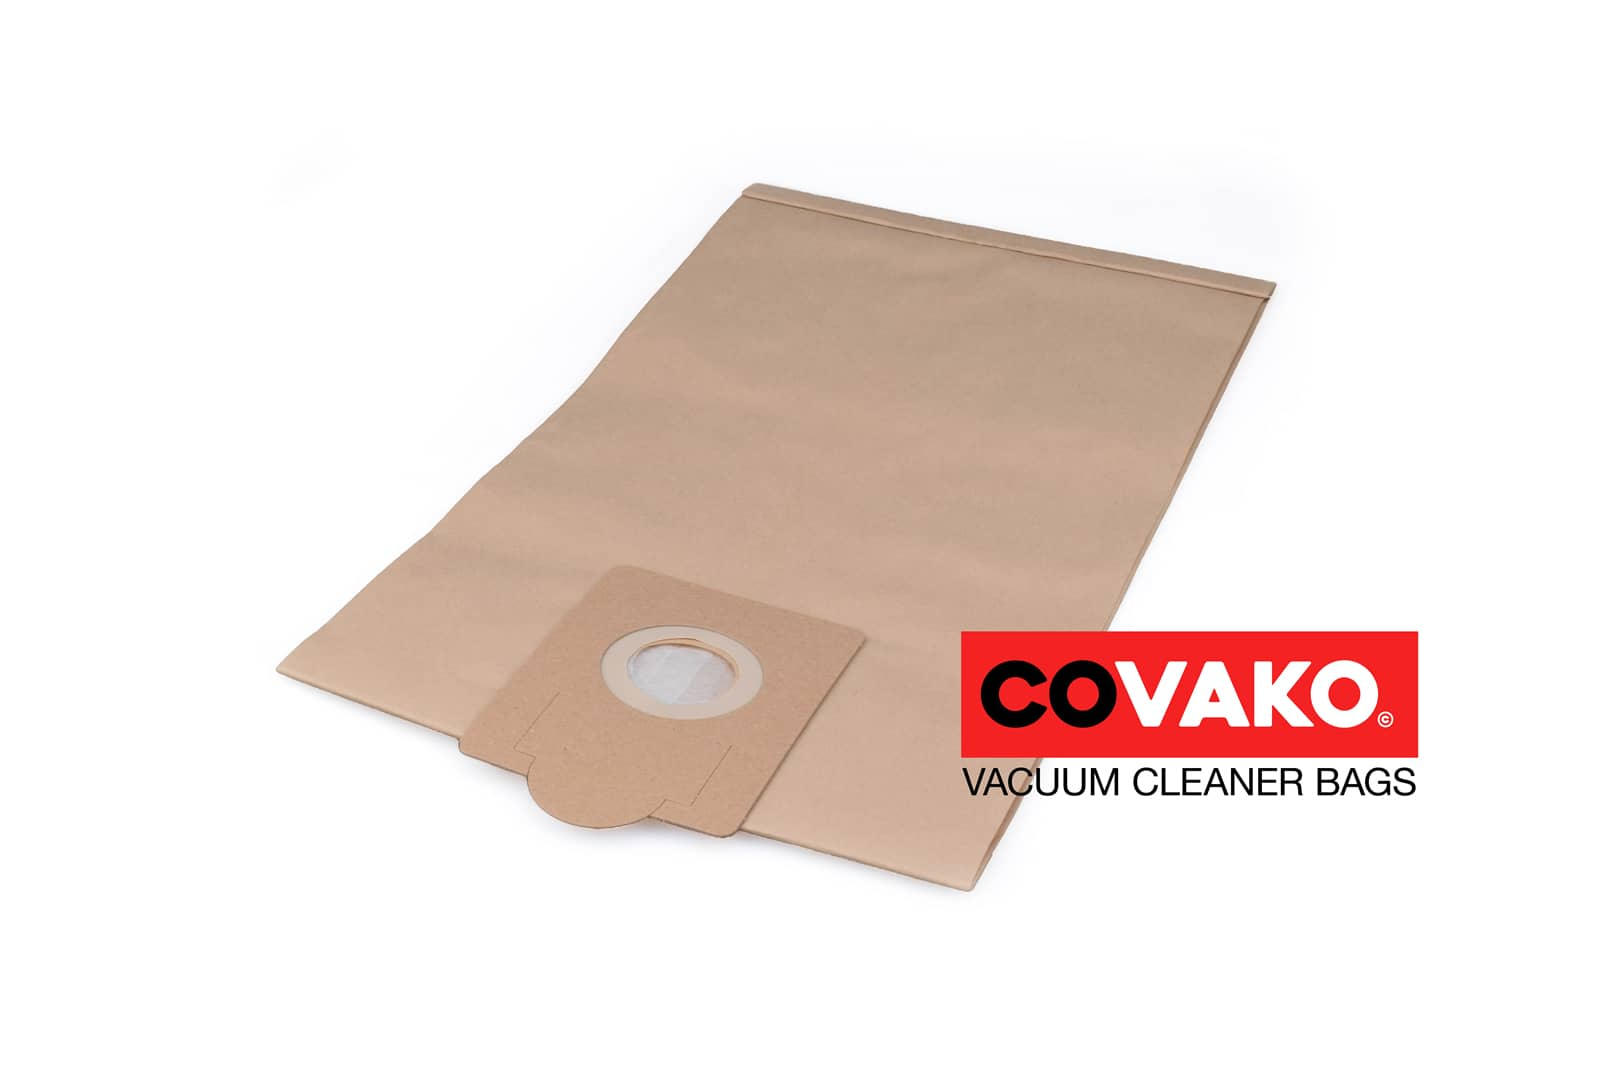 Eurom Force 1420 S wet/dry / Papier - Eurom sacs d'aspirateur